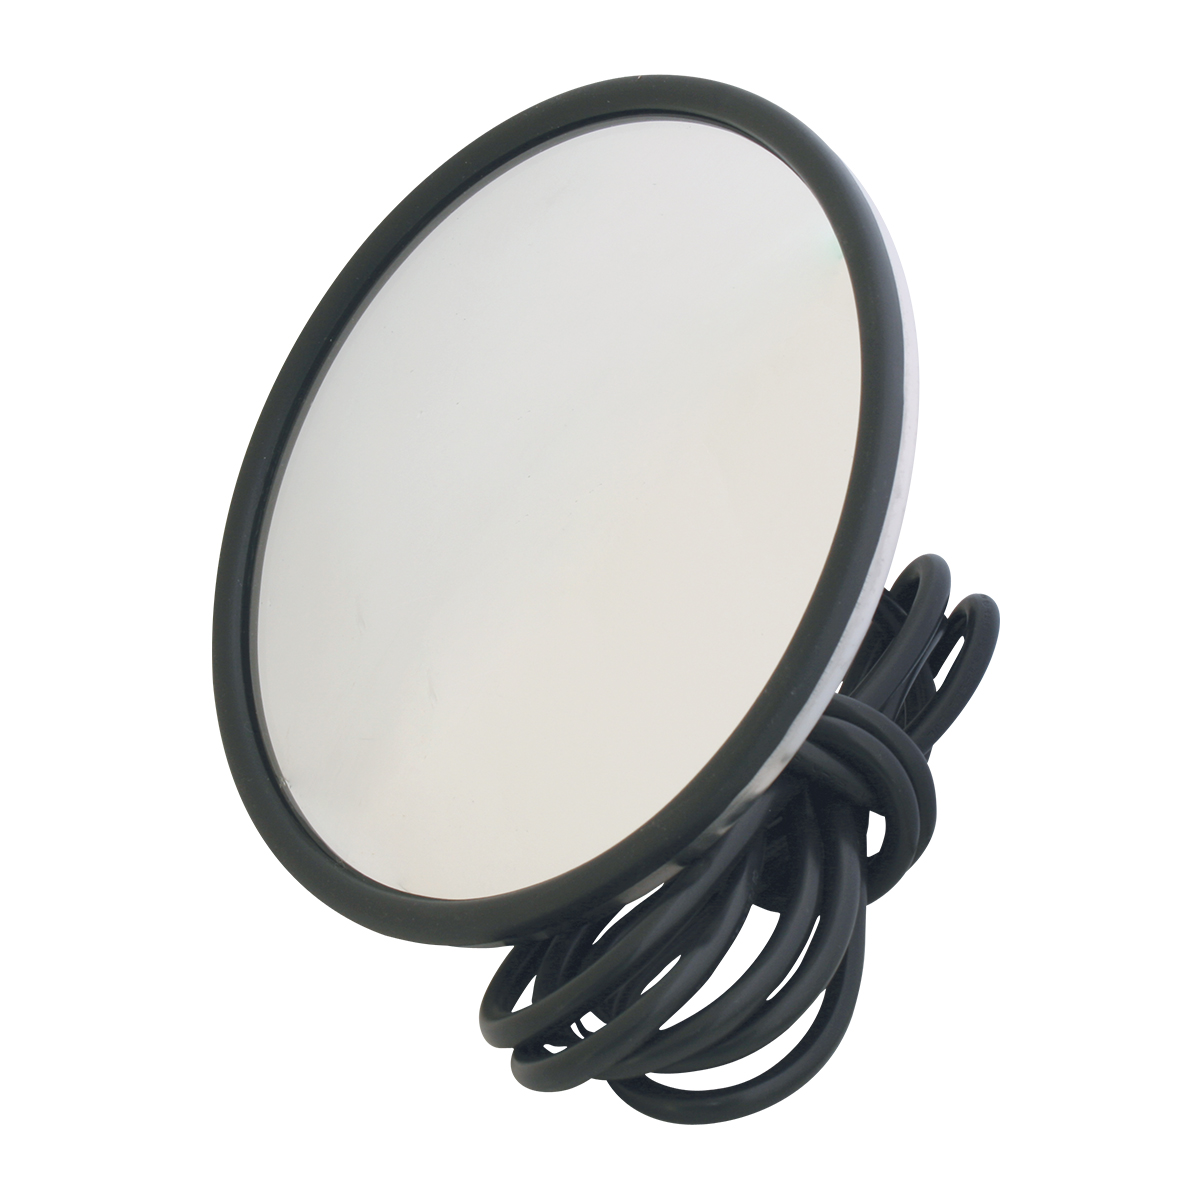 33332 Heated Convex Blind Spot Mirror